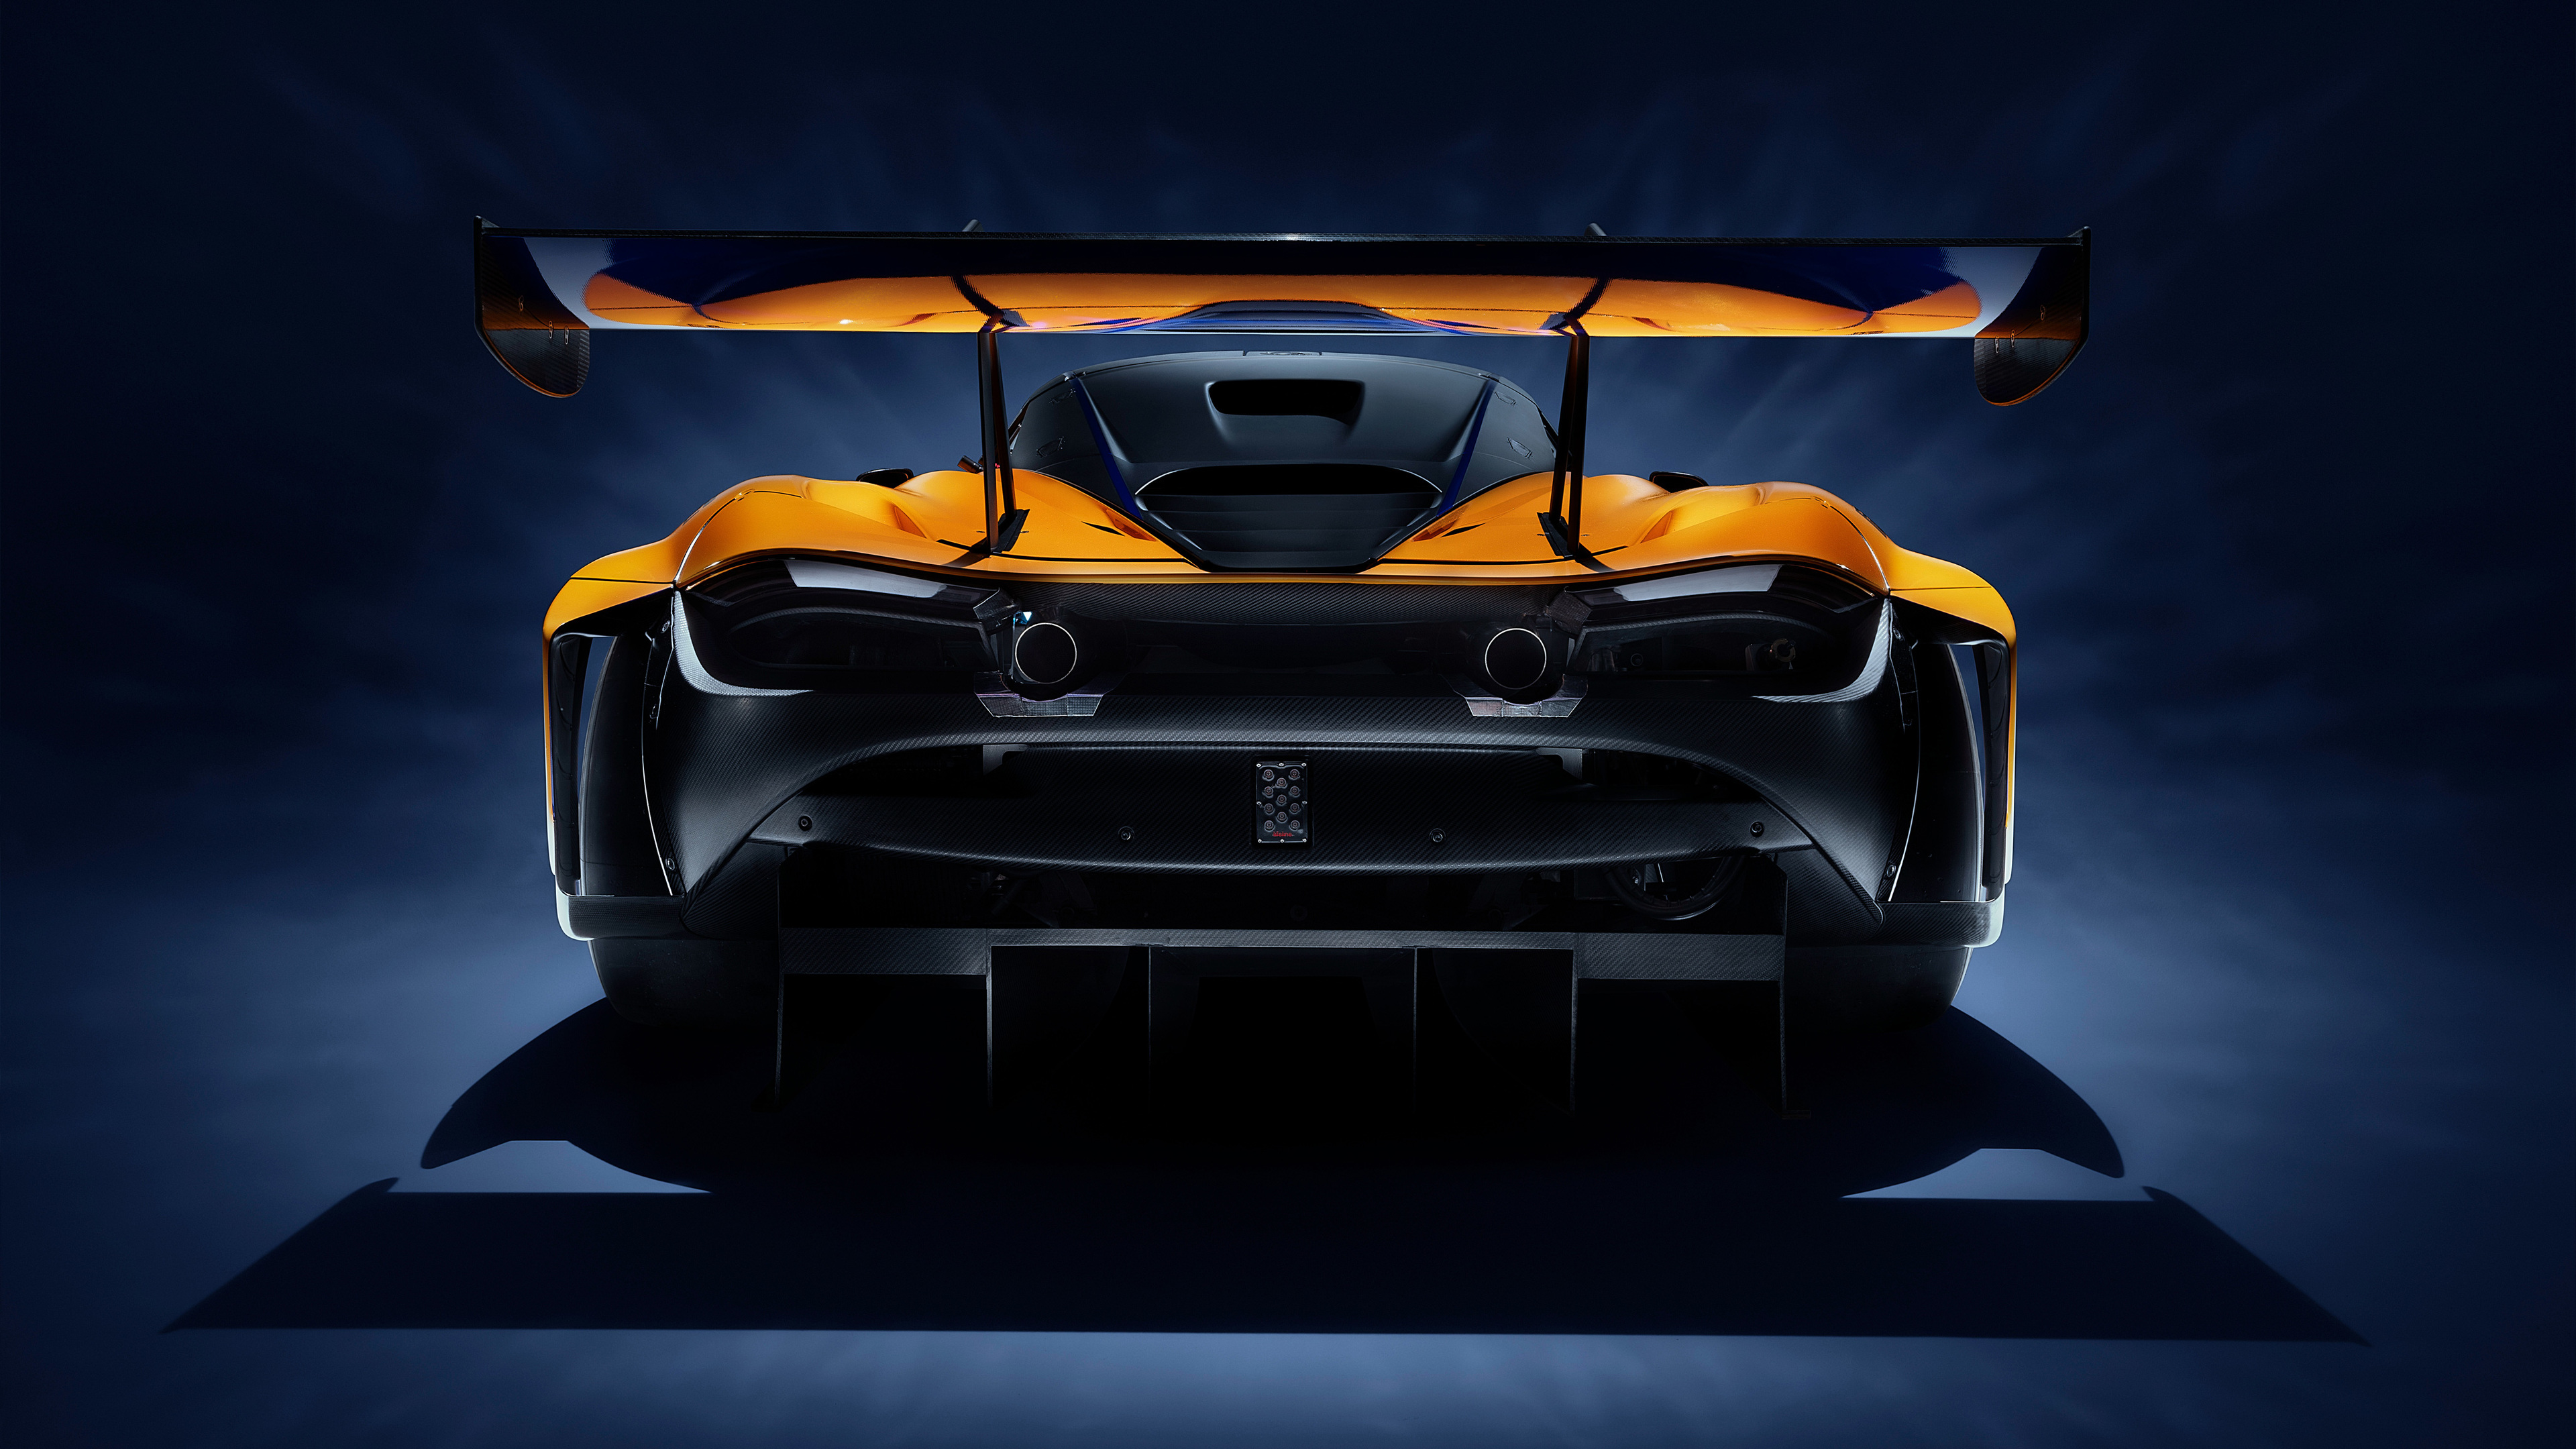 mclaren 720s gt3 2019 rear view 1539114032 - McLaren 720S GT3 2019 Rear View - mclaren wallpapers, mclaren 720s wallpapers, mclaren 720s gt3 wallpapers, hd-wallpapers, cars wallpapers, 4k-wallpapers, 2019 cars wallpapers